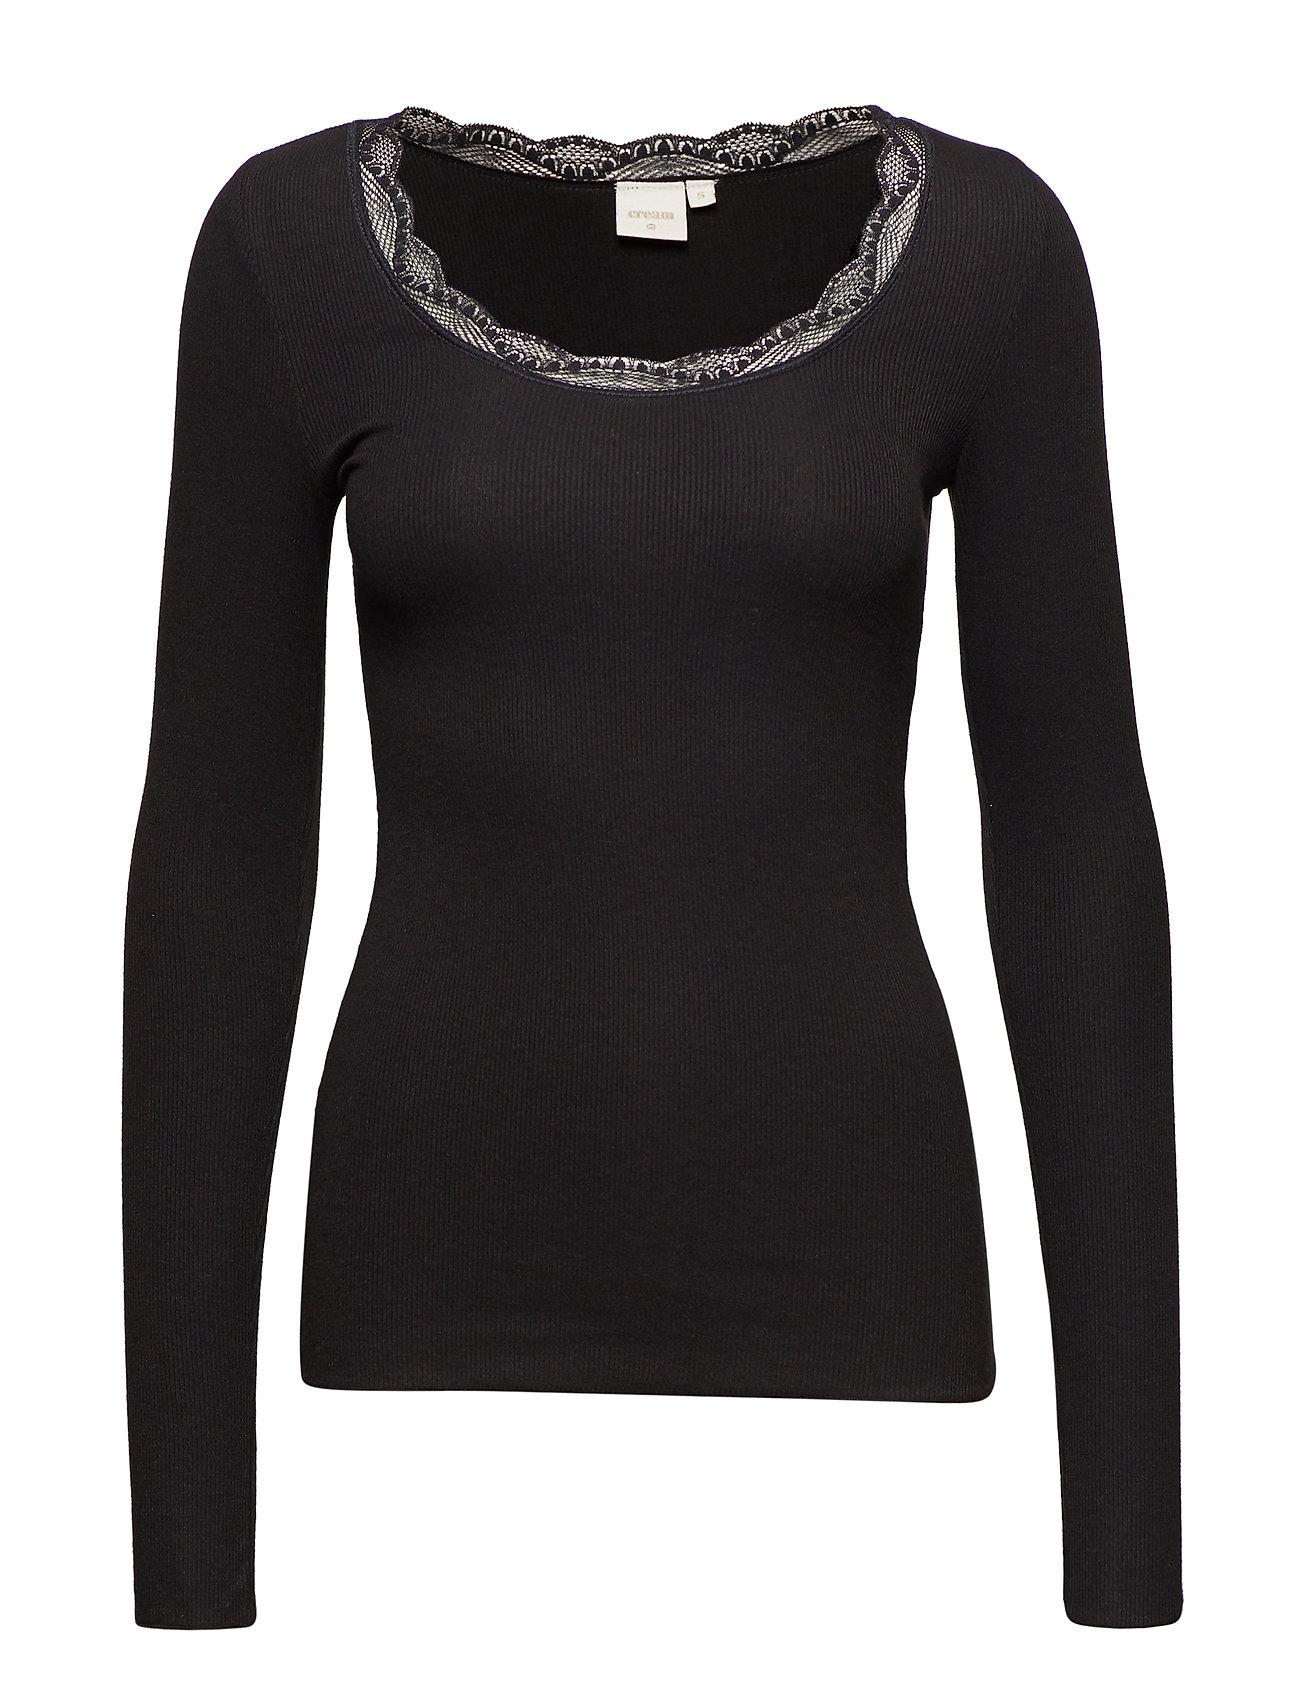 8d0e3d2c820e Vanessa L s T-shirt (Pitch Black) (249.95 kr) - Cream -